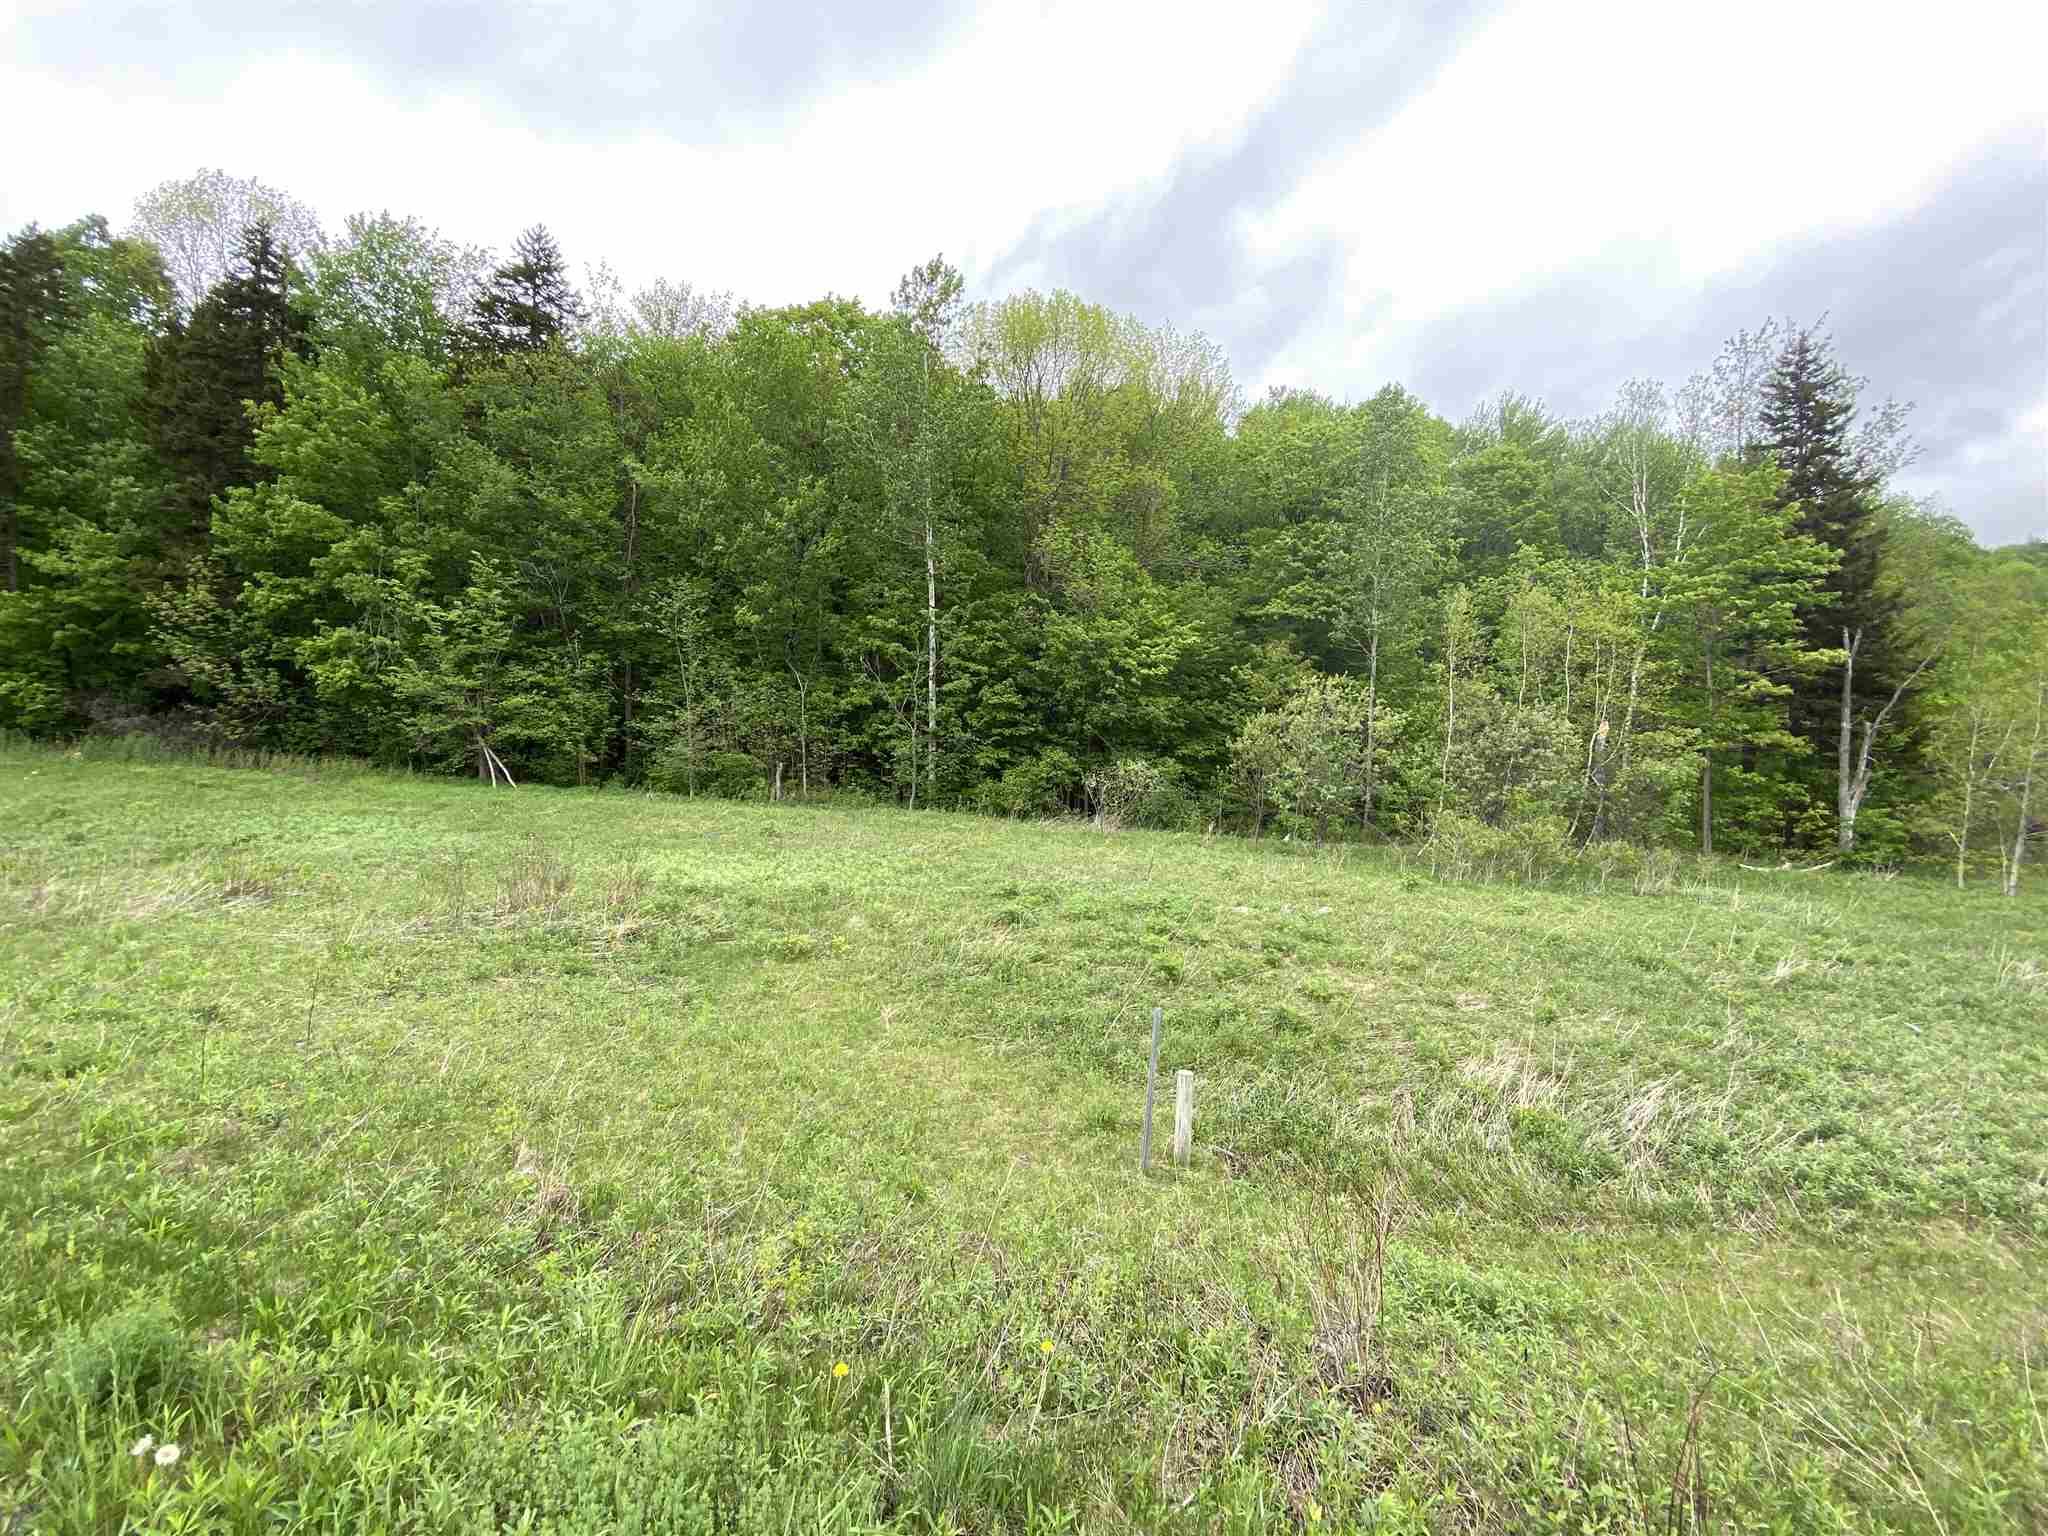 Real Estate for Sale, ListingId: 36574703, Wilmington,VT05363